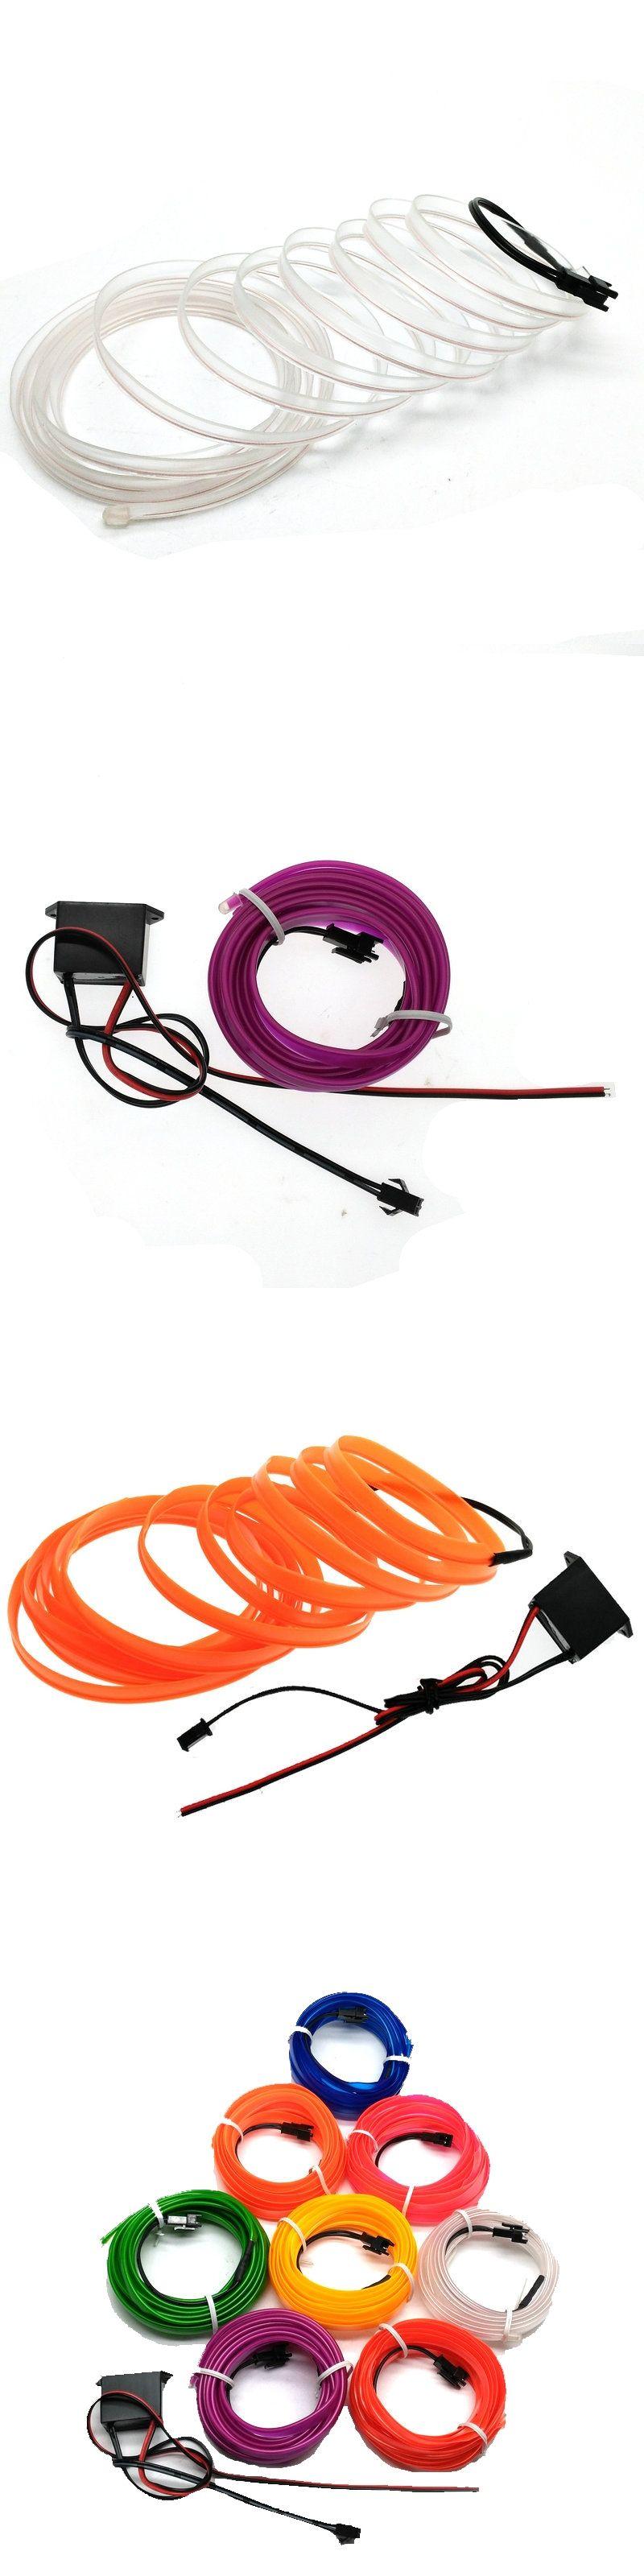 12V car lights 6mm Sewing Edge Flexible EL Wire Neon Light Dance ...